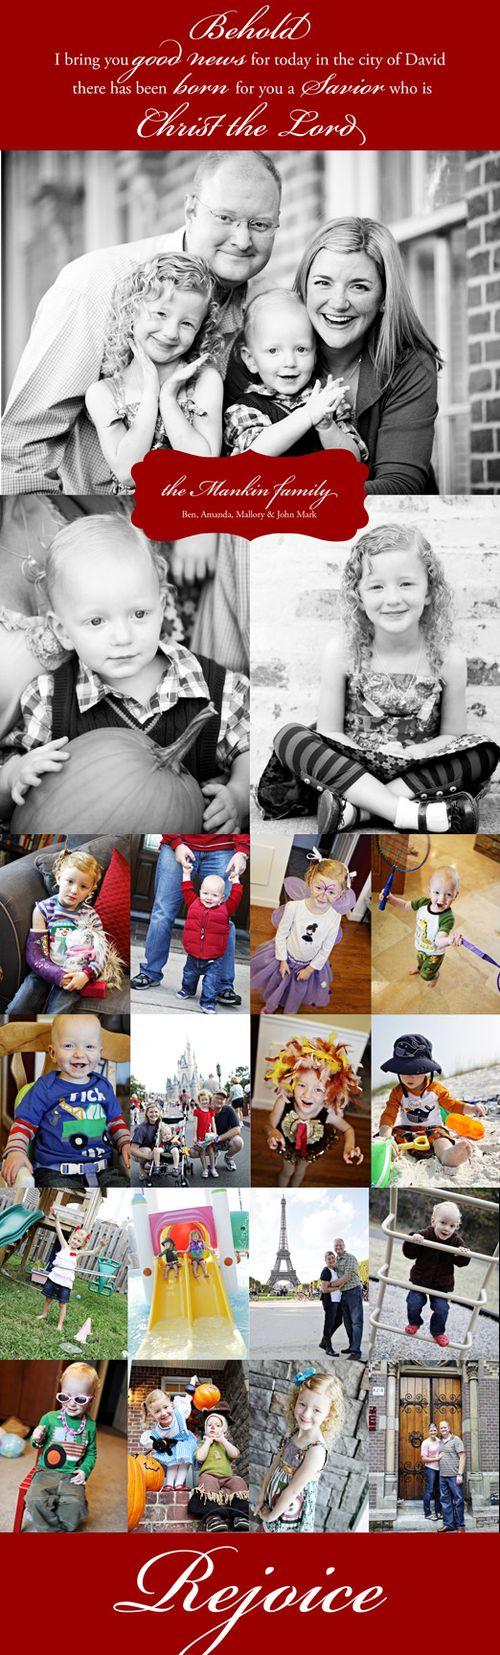 Web holiday 2011 card jpg2